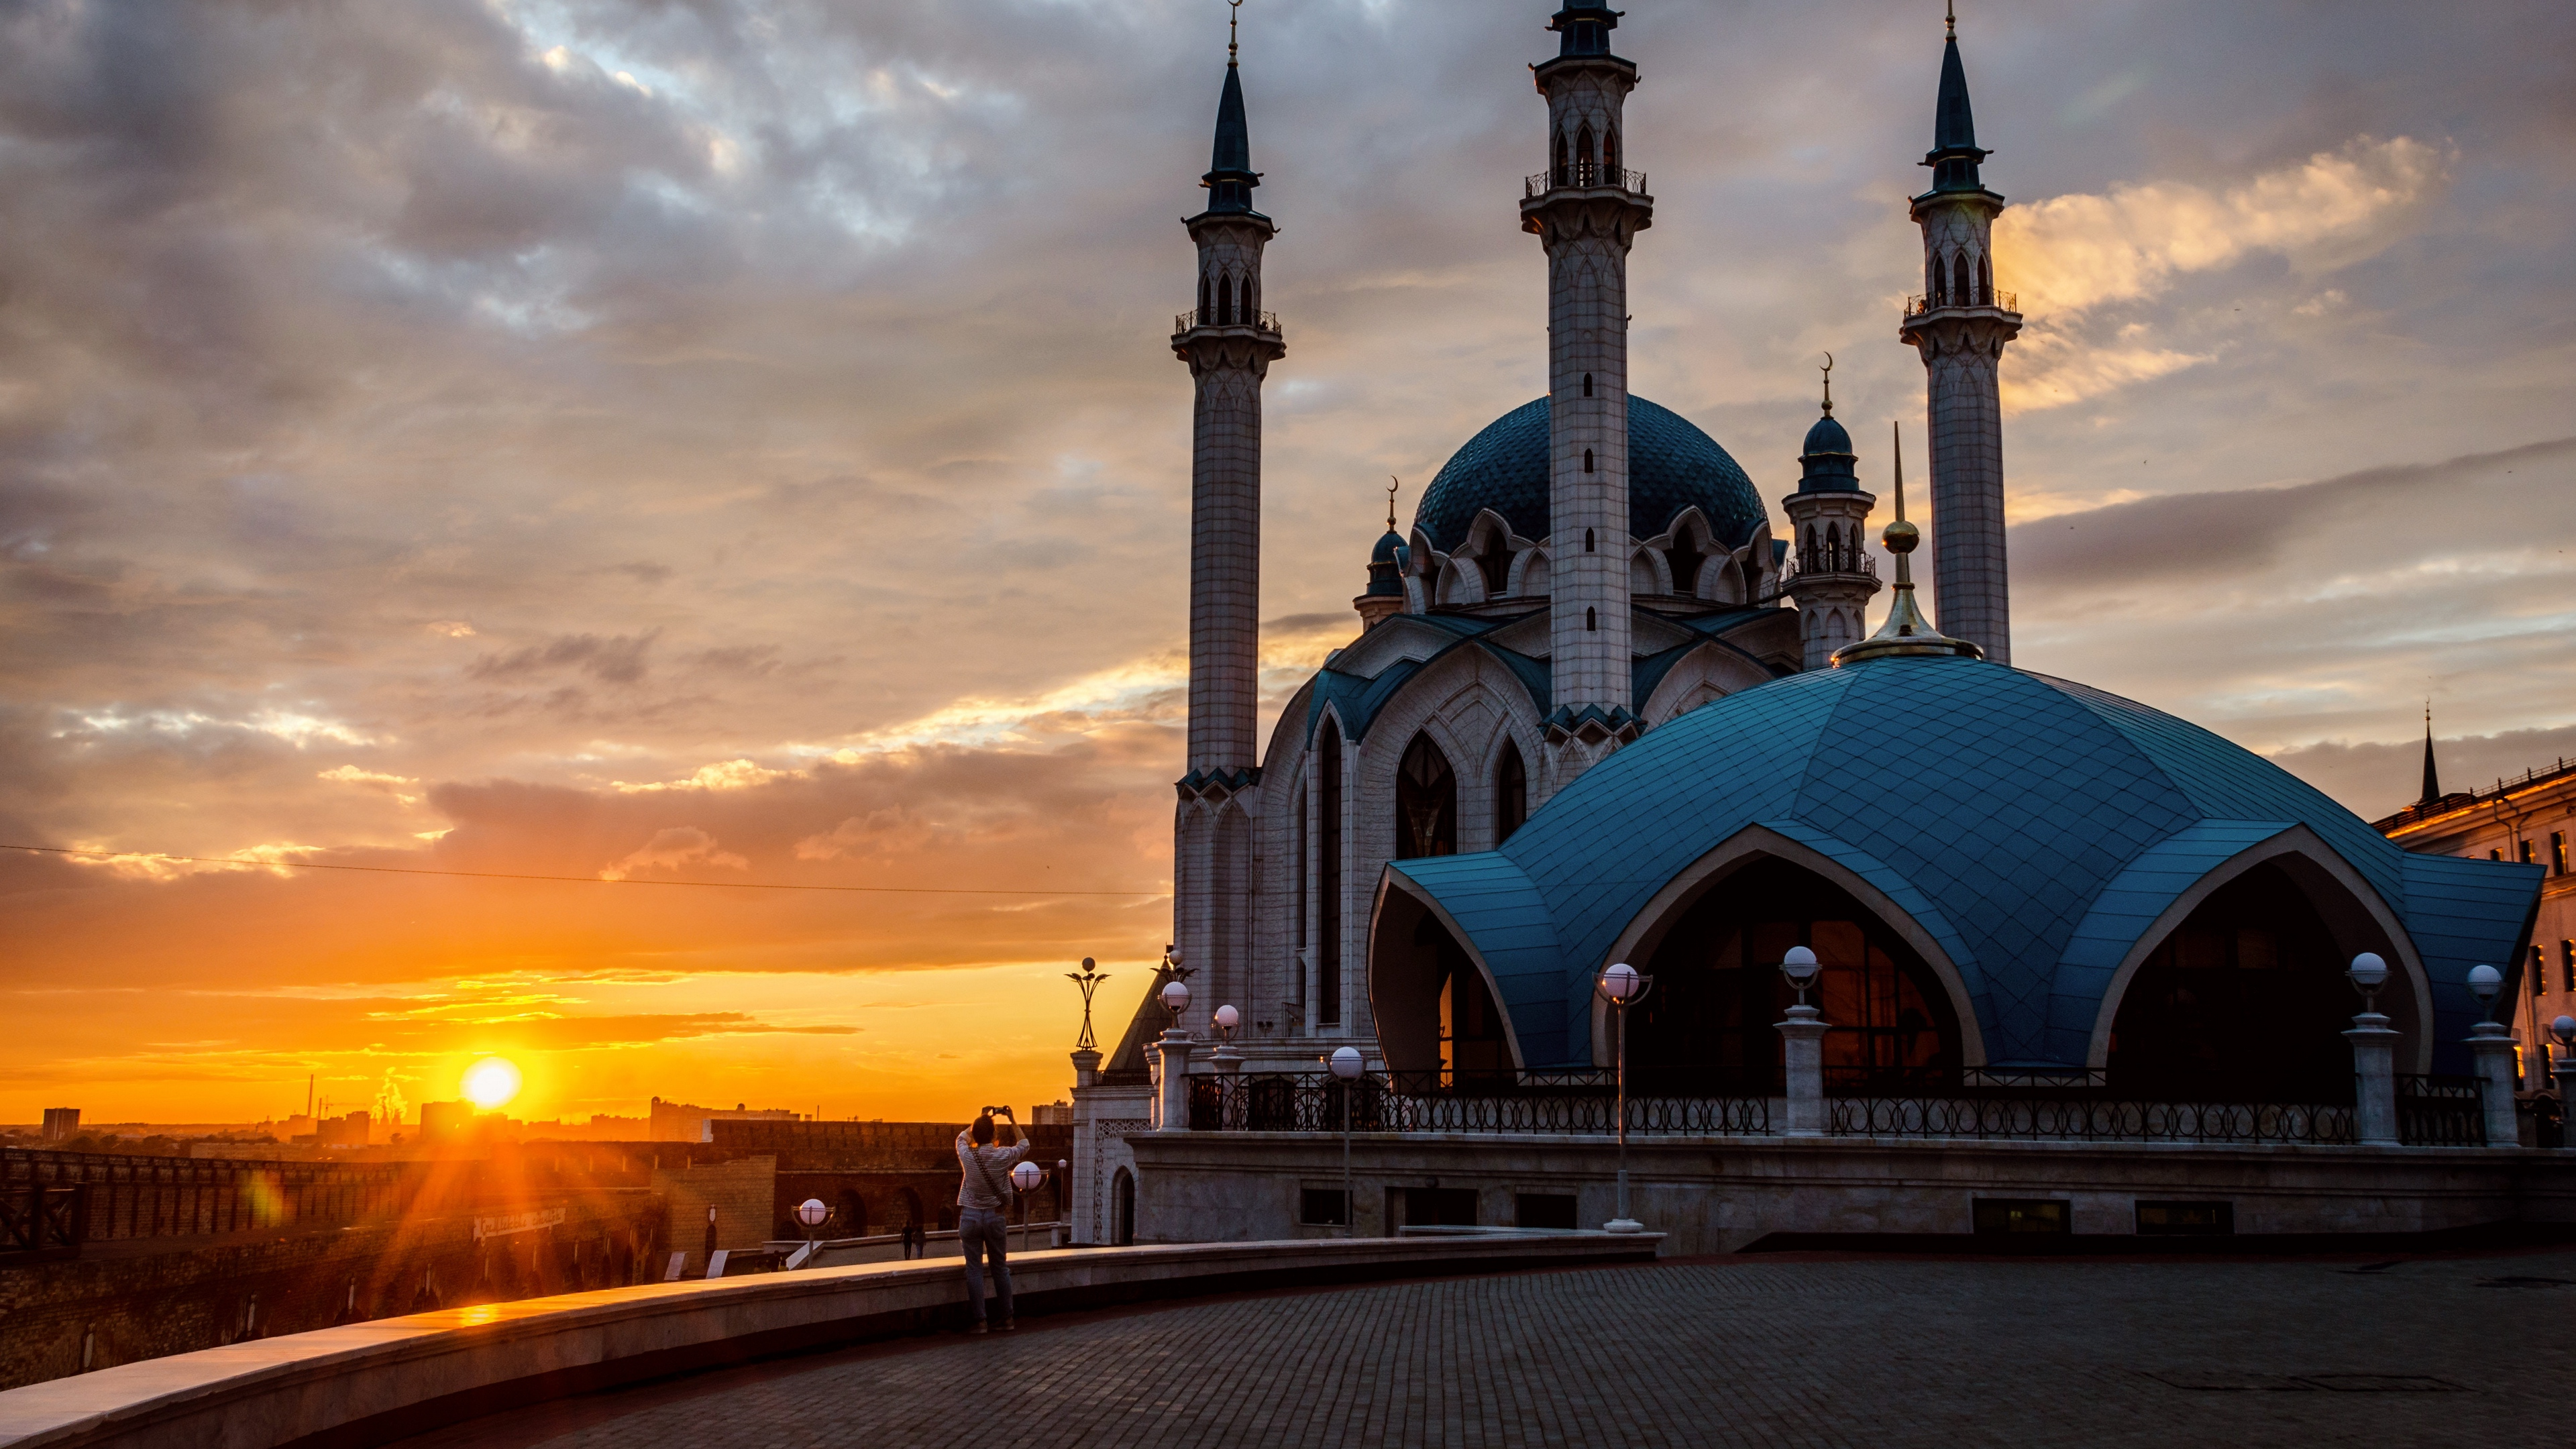 mosque kazan tatarstan sunset 4k 1538064658 - mosque, kazan, tatarstan, sunset 4k - tatarstan, Mosque, kazan